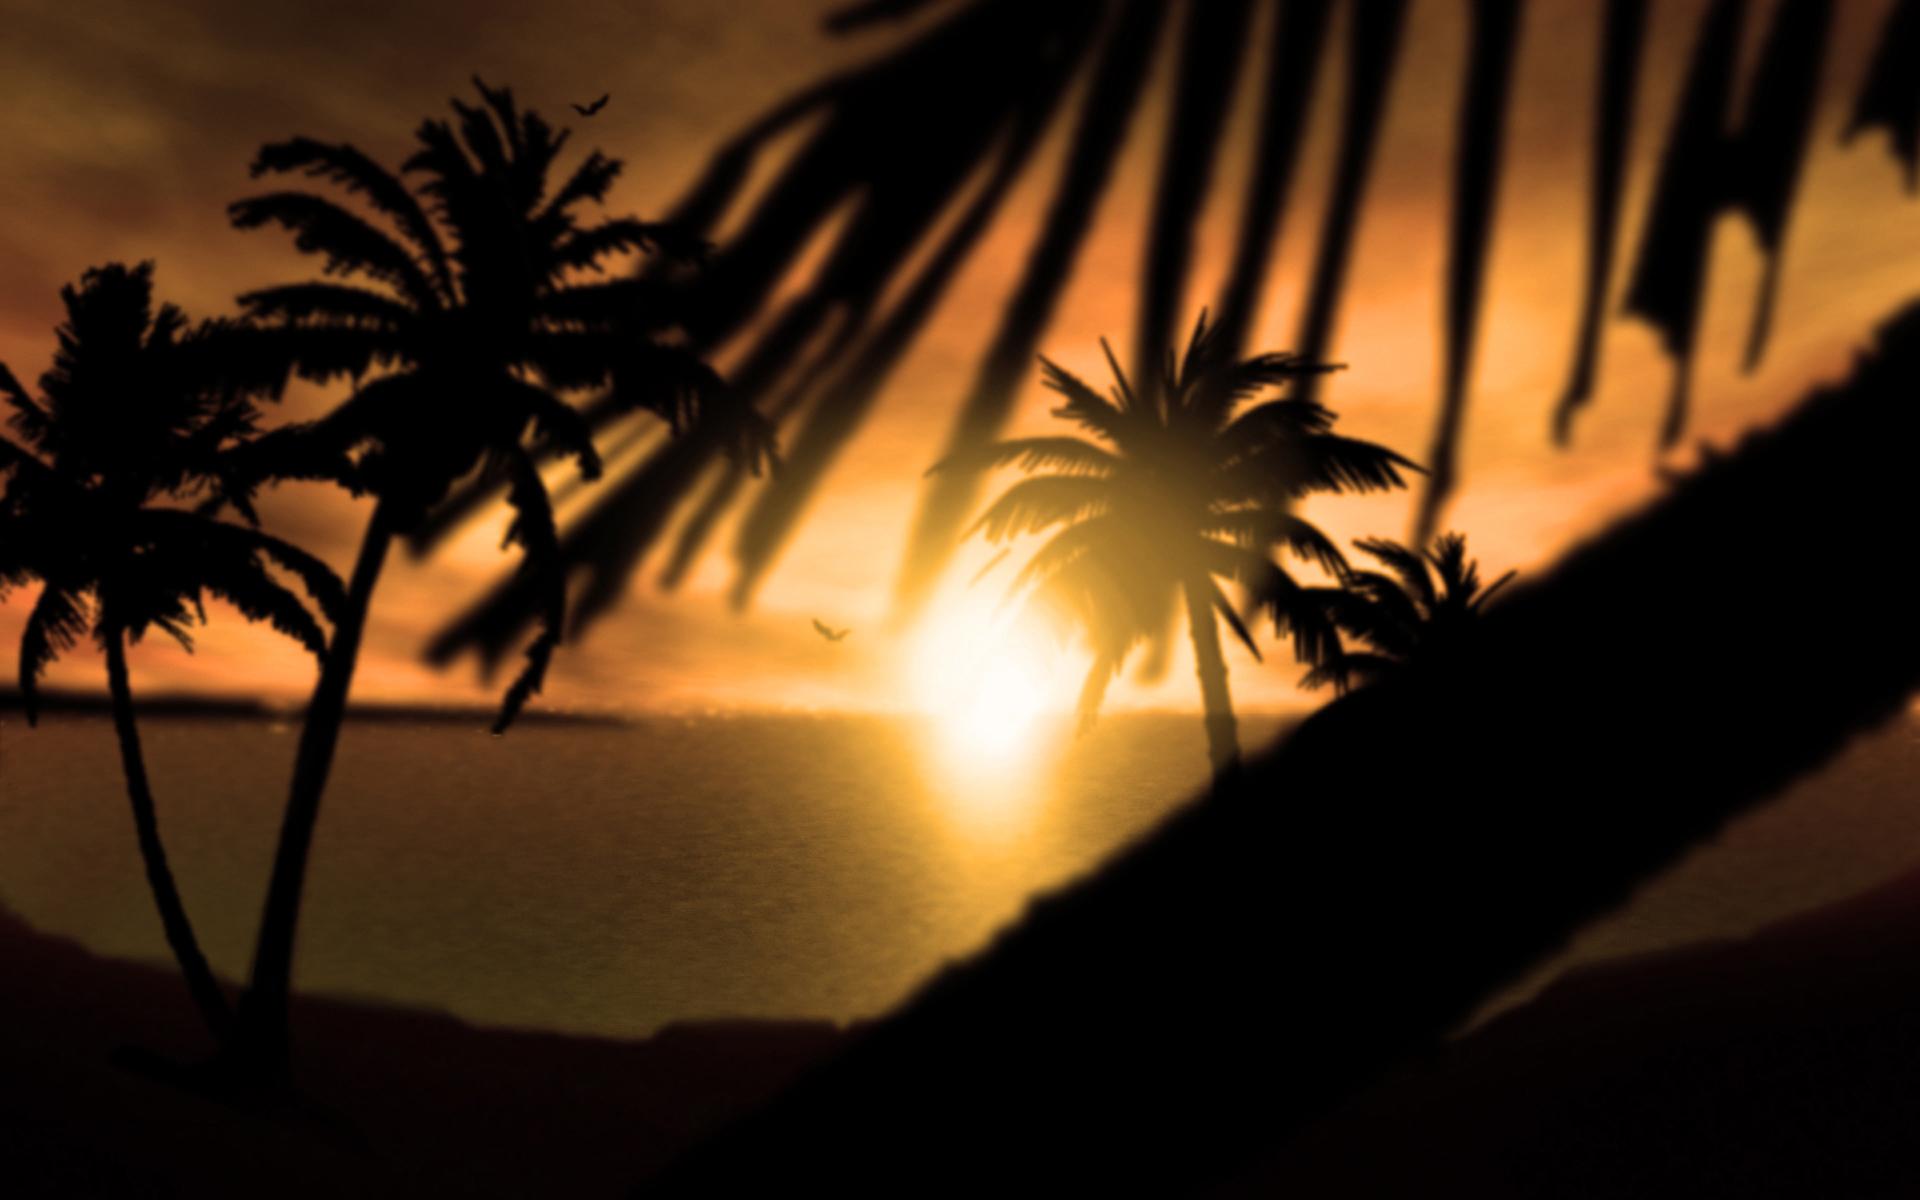 Coucher de soleil fond d 39 cran hd 6 10 000 fonds d for Ecran de fond hd